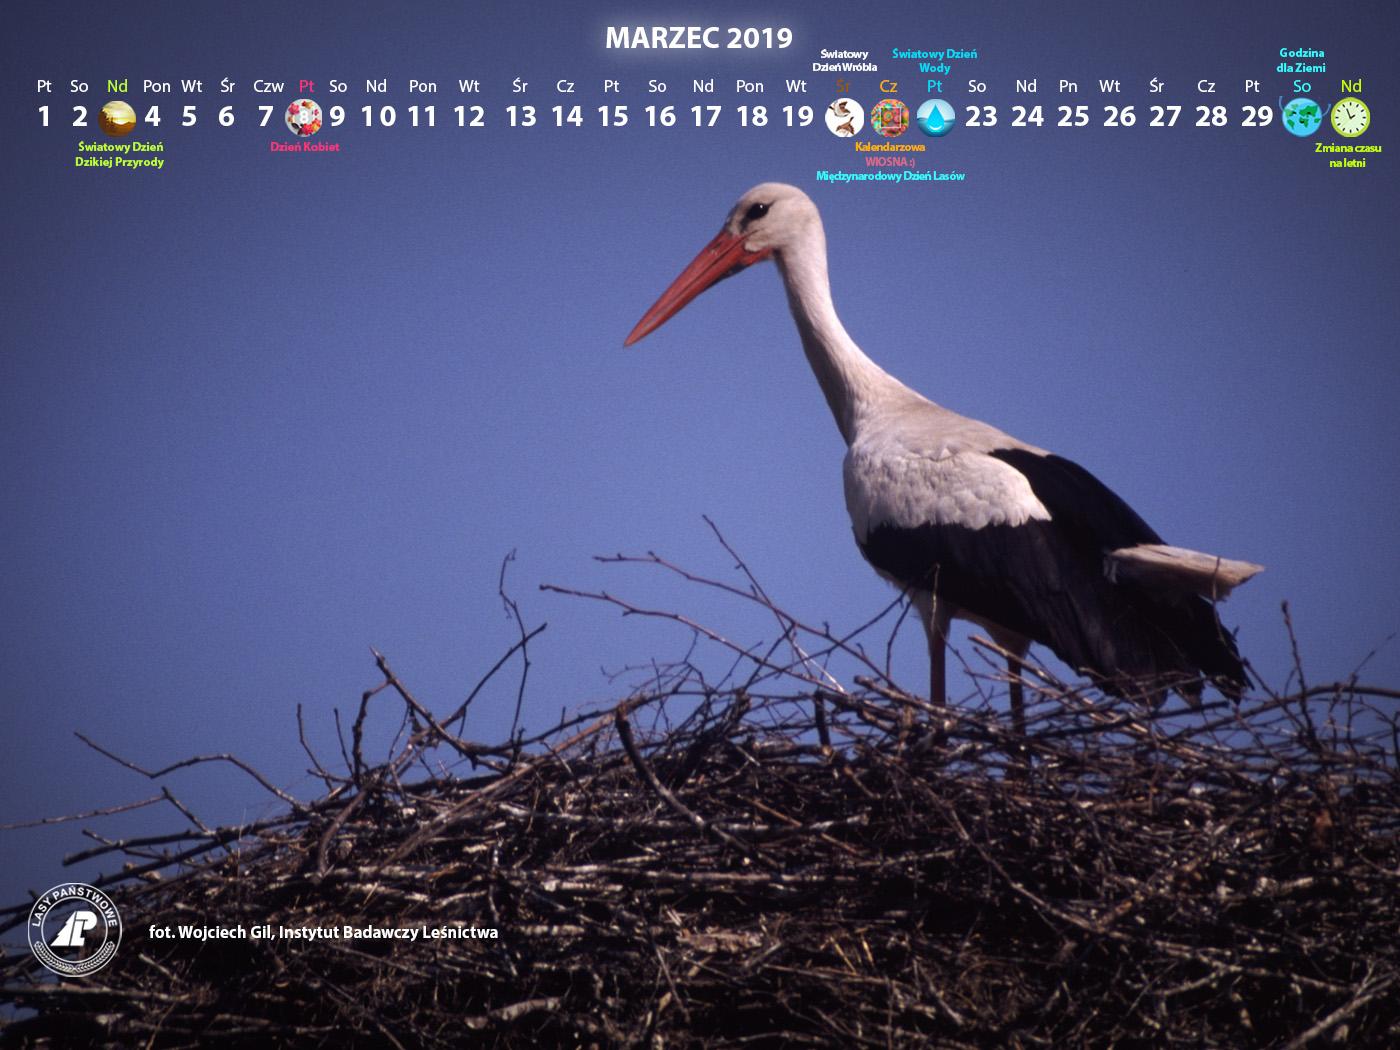 Kalendarz_marzec_2019_1400x1050[1].jpg